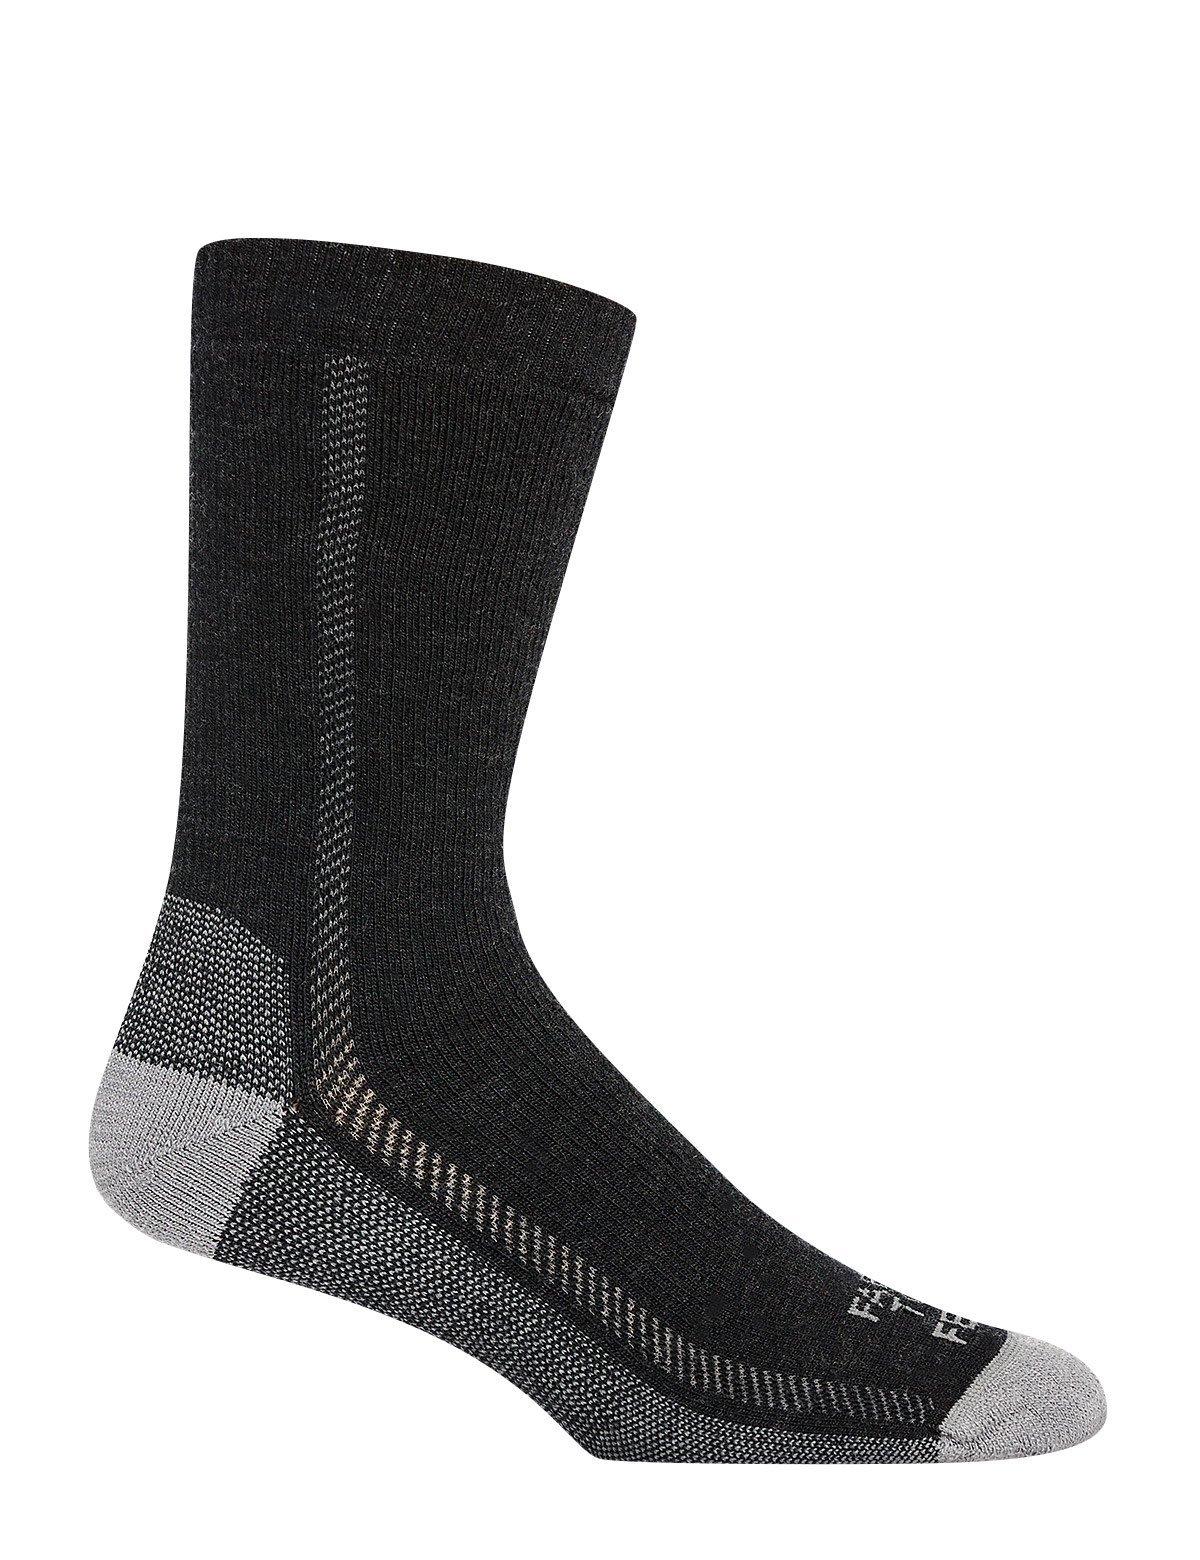 Farm to Feet Lightweight Madison Crew Socks, Charcoal, Small by Farm to Feet